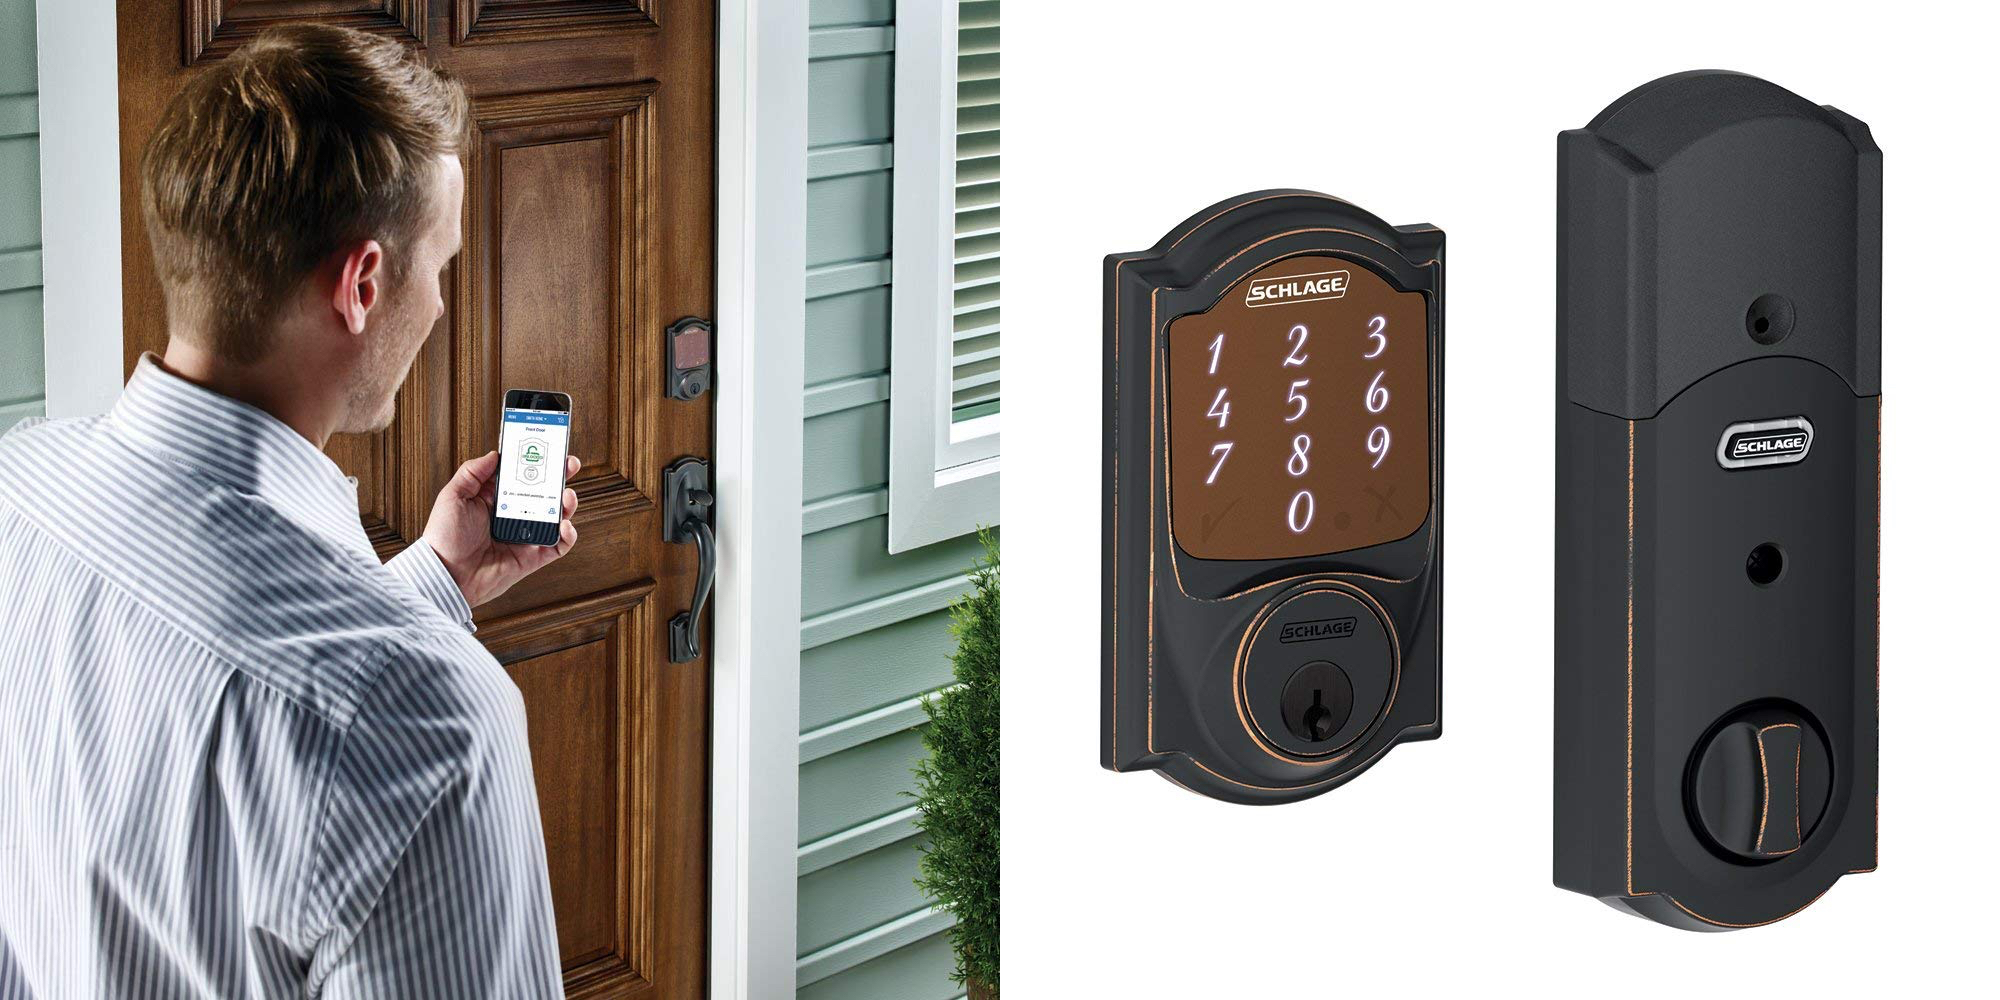 Command Schlage's Sense HomeKit Smart Deadbolt with Siri at $155 shipped (Reg. $229)